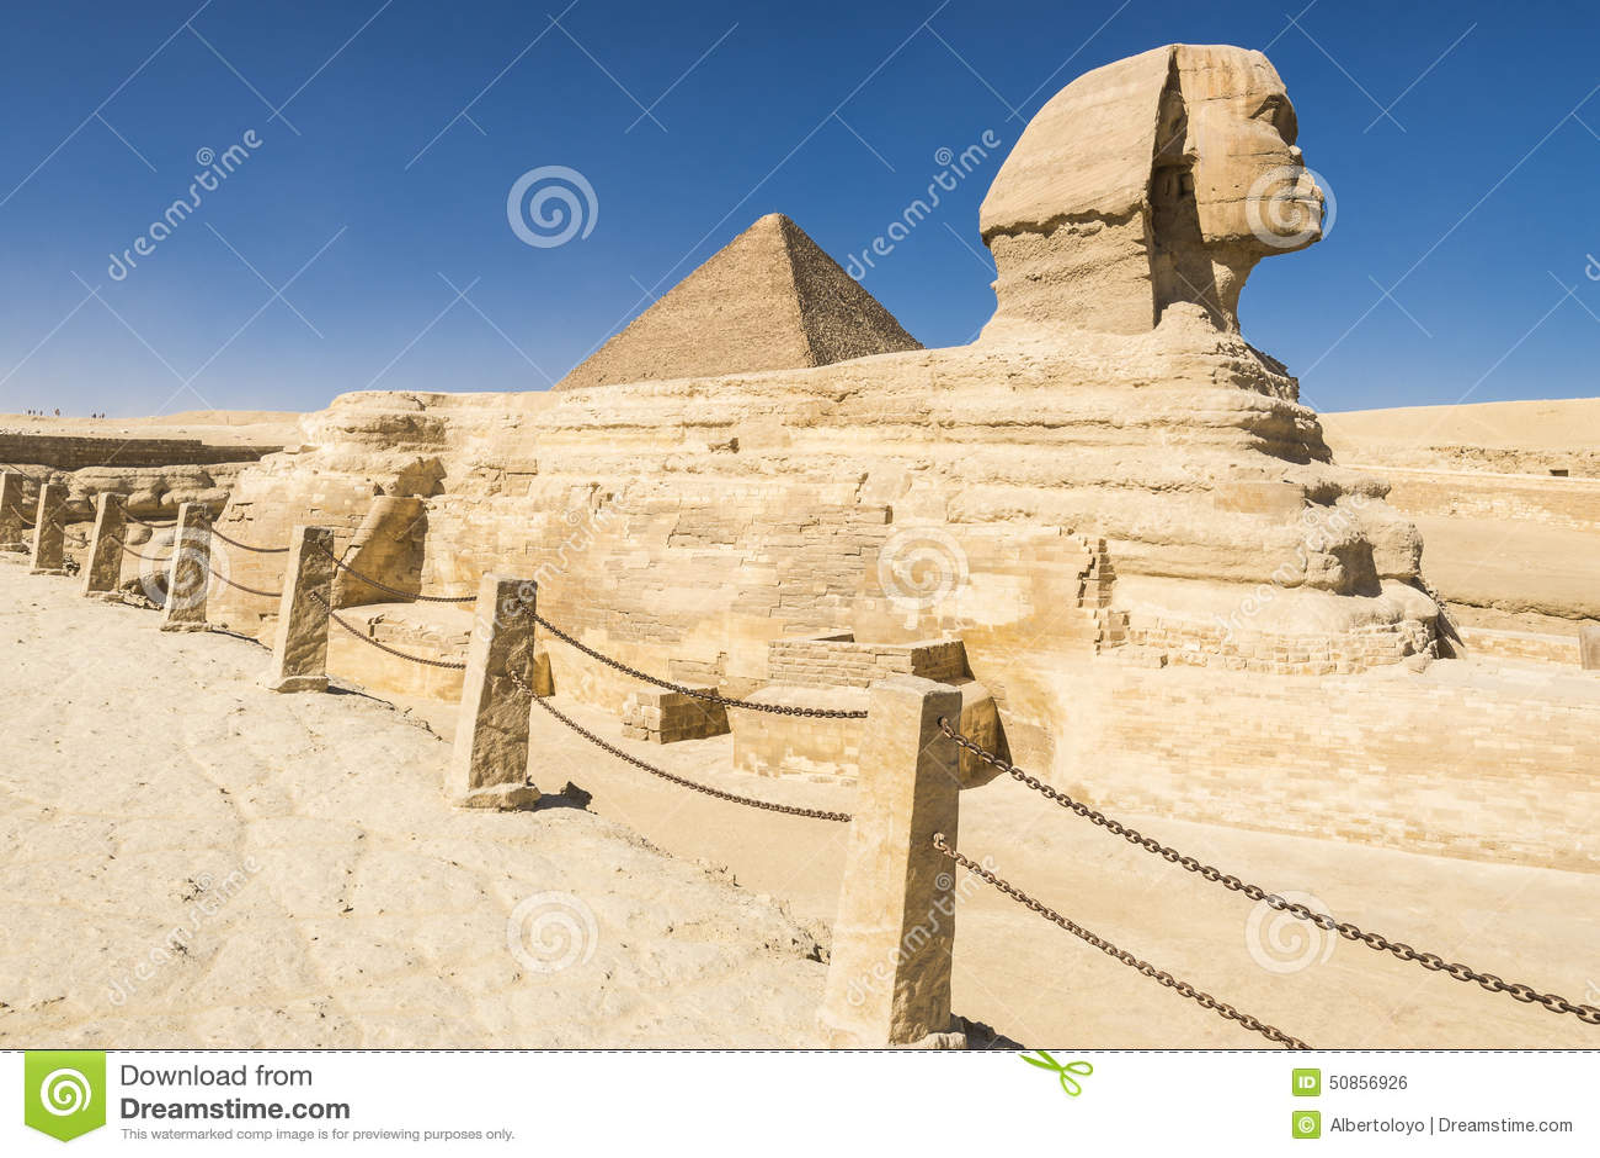 Sphinx And Great Pyramid Of Pharaoh Khufu, Giza (Egypt